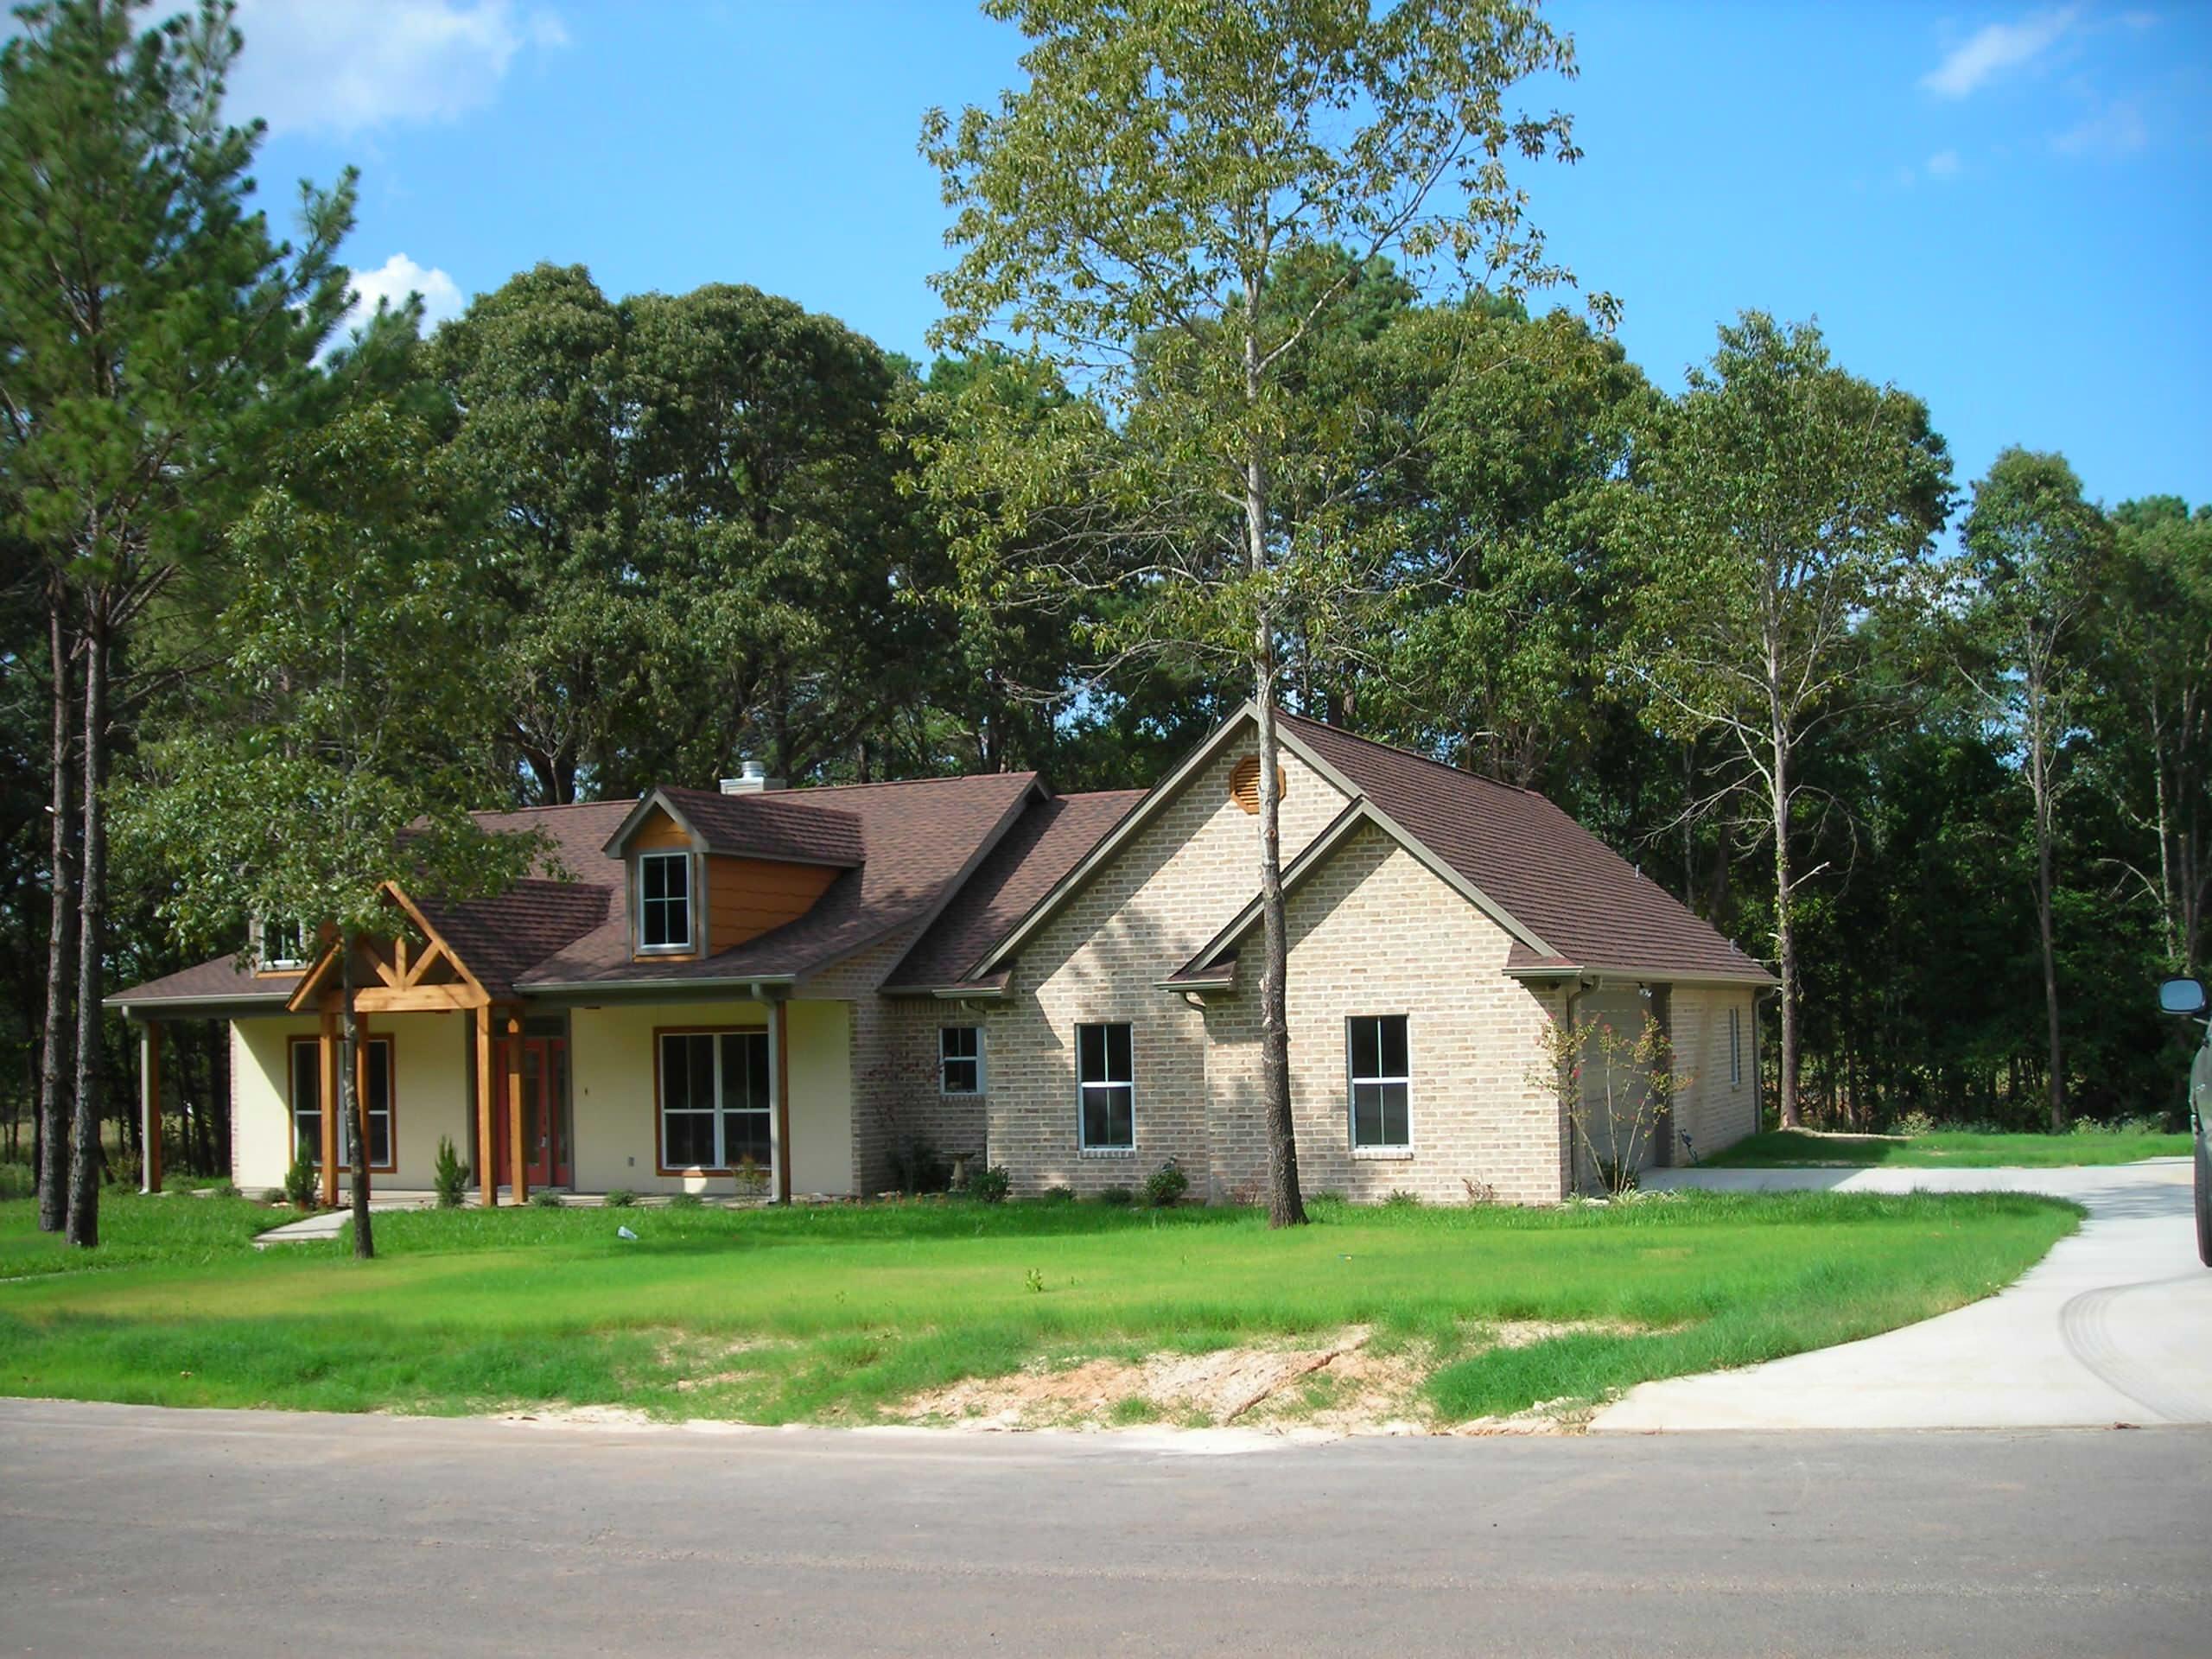 2006 Parade of Homes